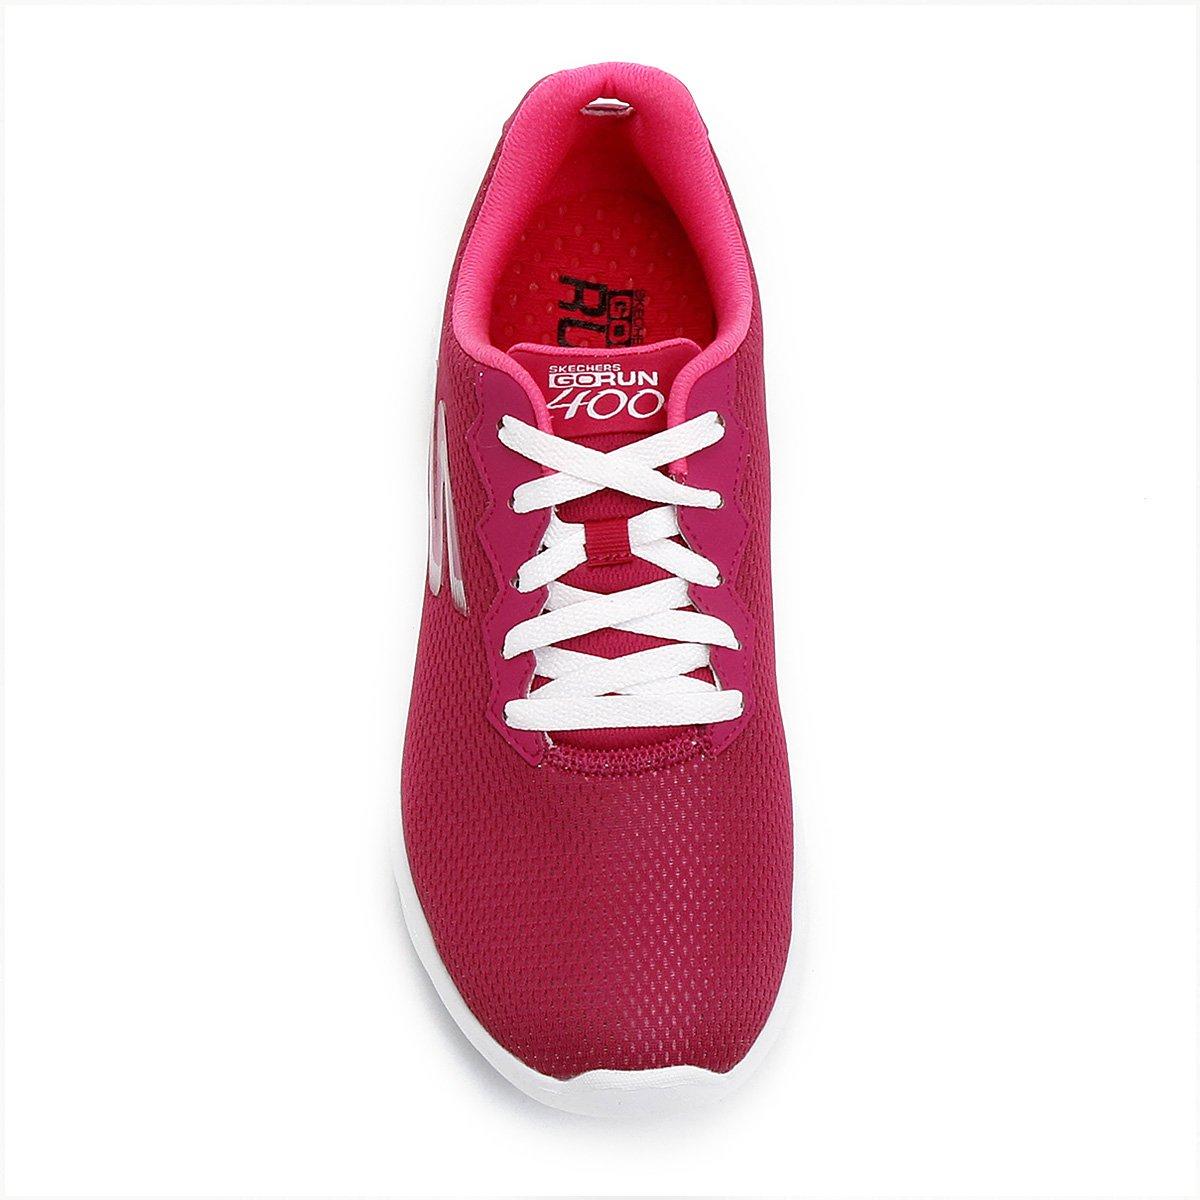 eee7b02417 Tênis Skechers Go Run 400 Feminino - Rosa Escuro - Compre Agora ...